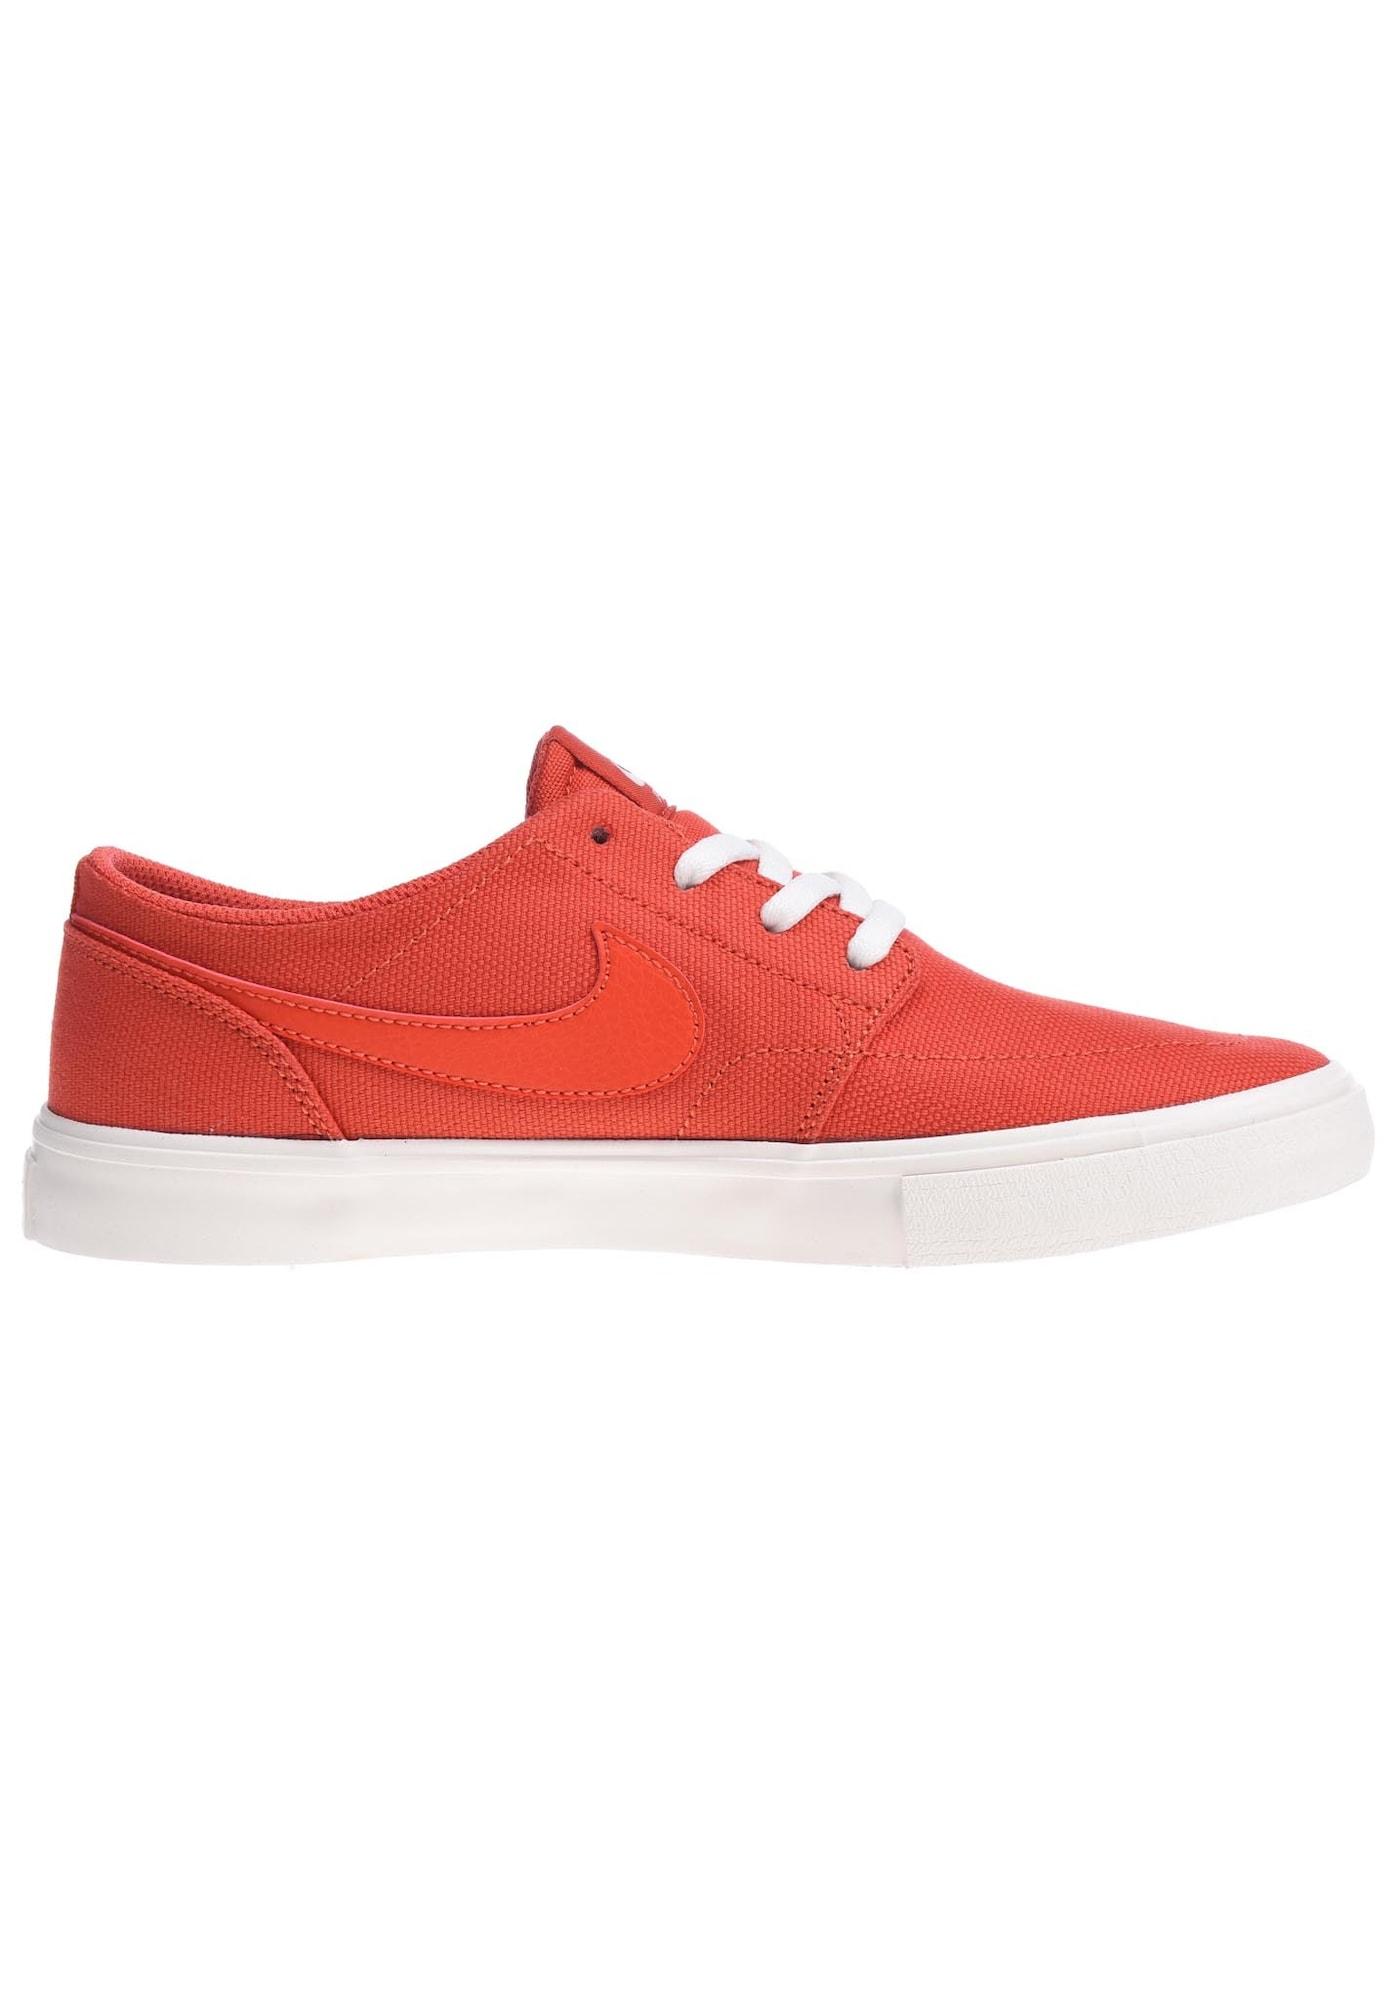 Nike SB, Damen Sneakers laag Portmore Ii Slr C, donkeroranje